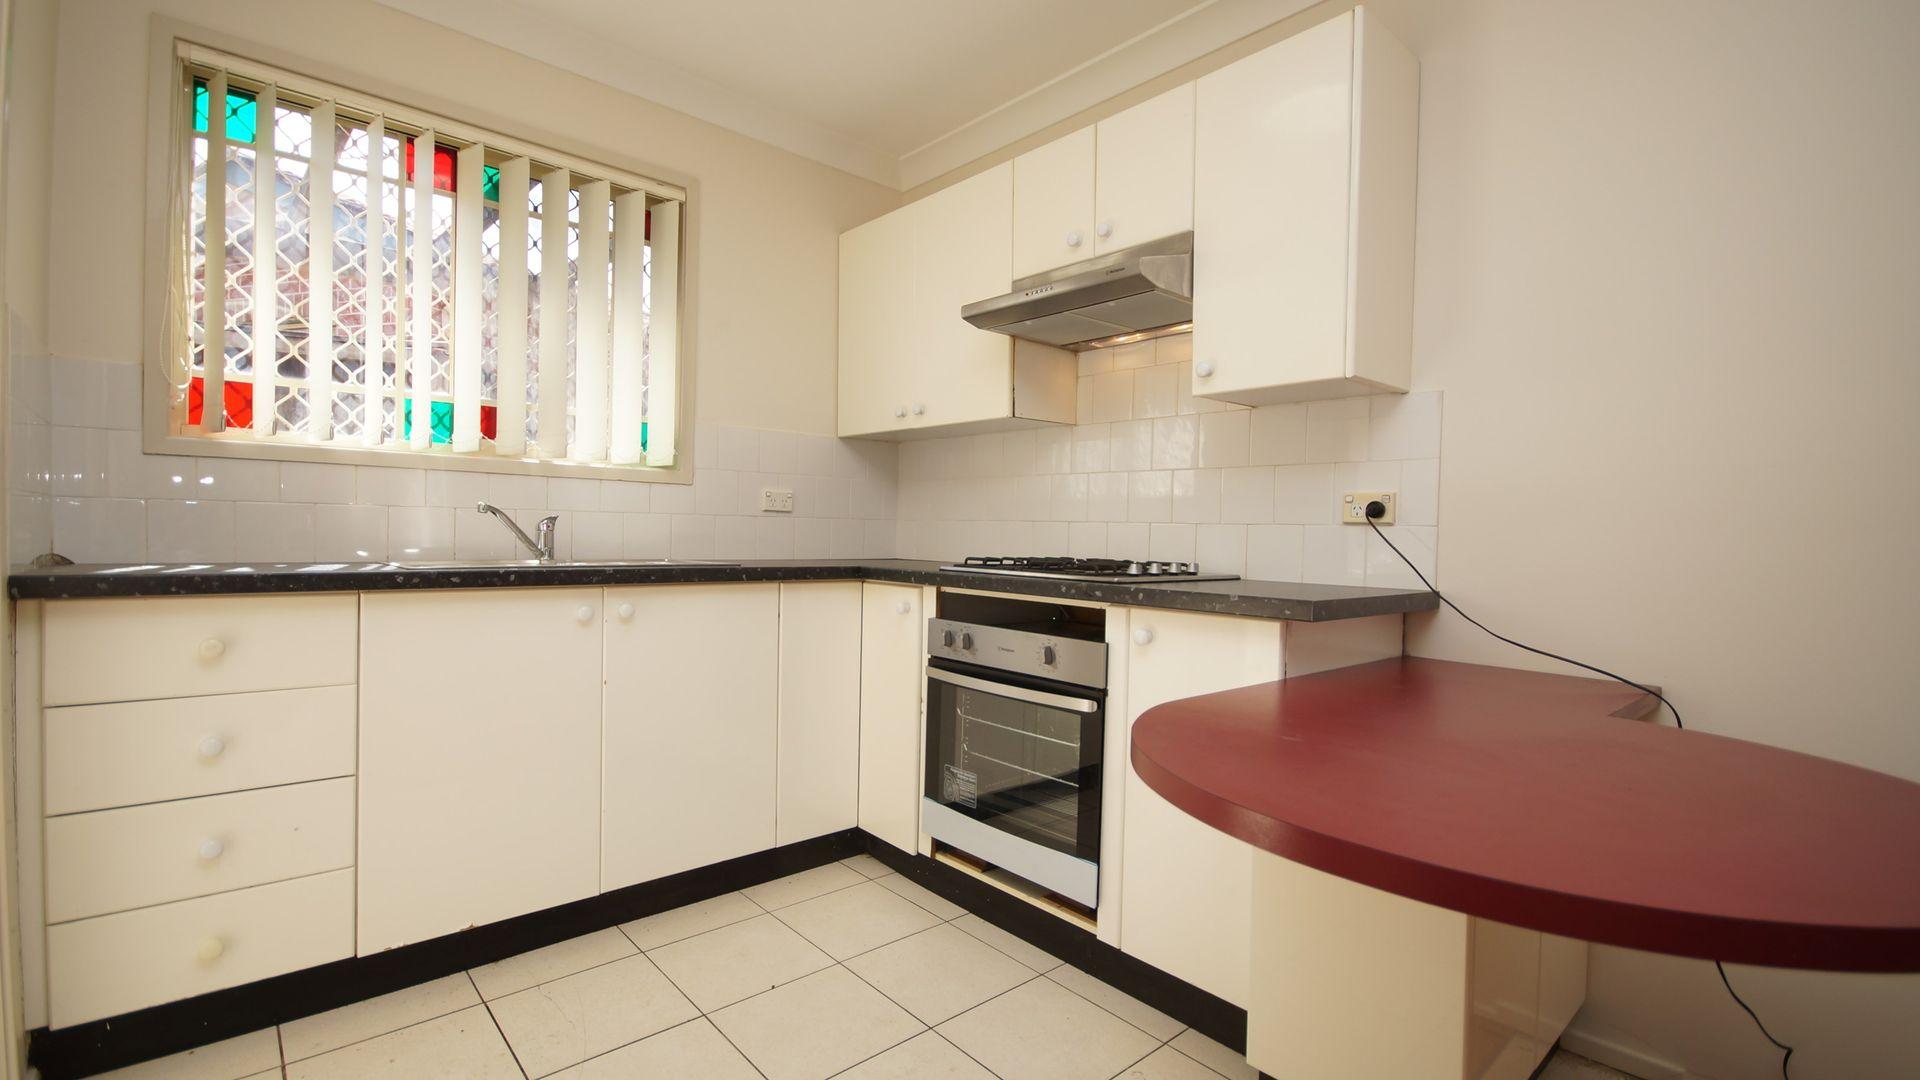 29/129-135 Frances Street, Lidcombe NSW 2141, Image 1